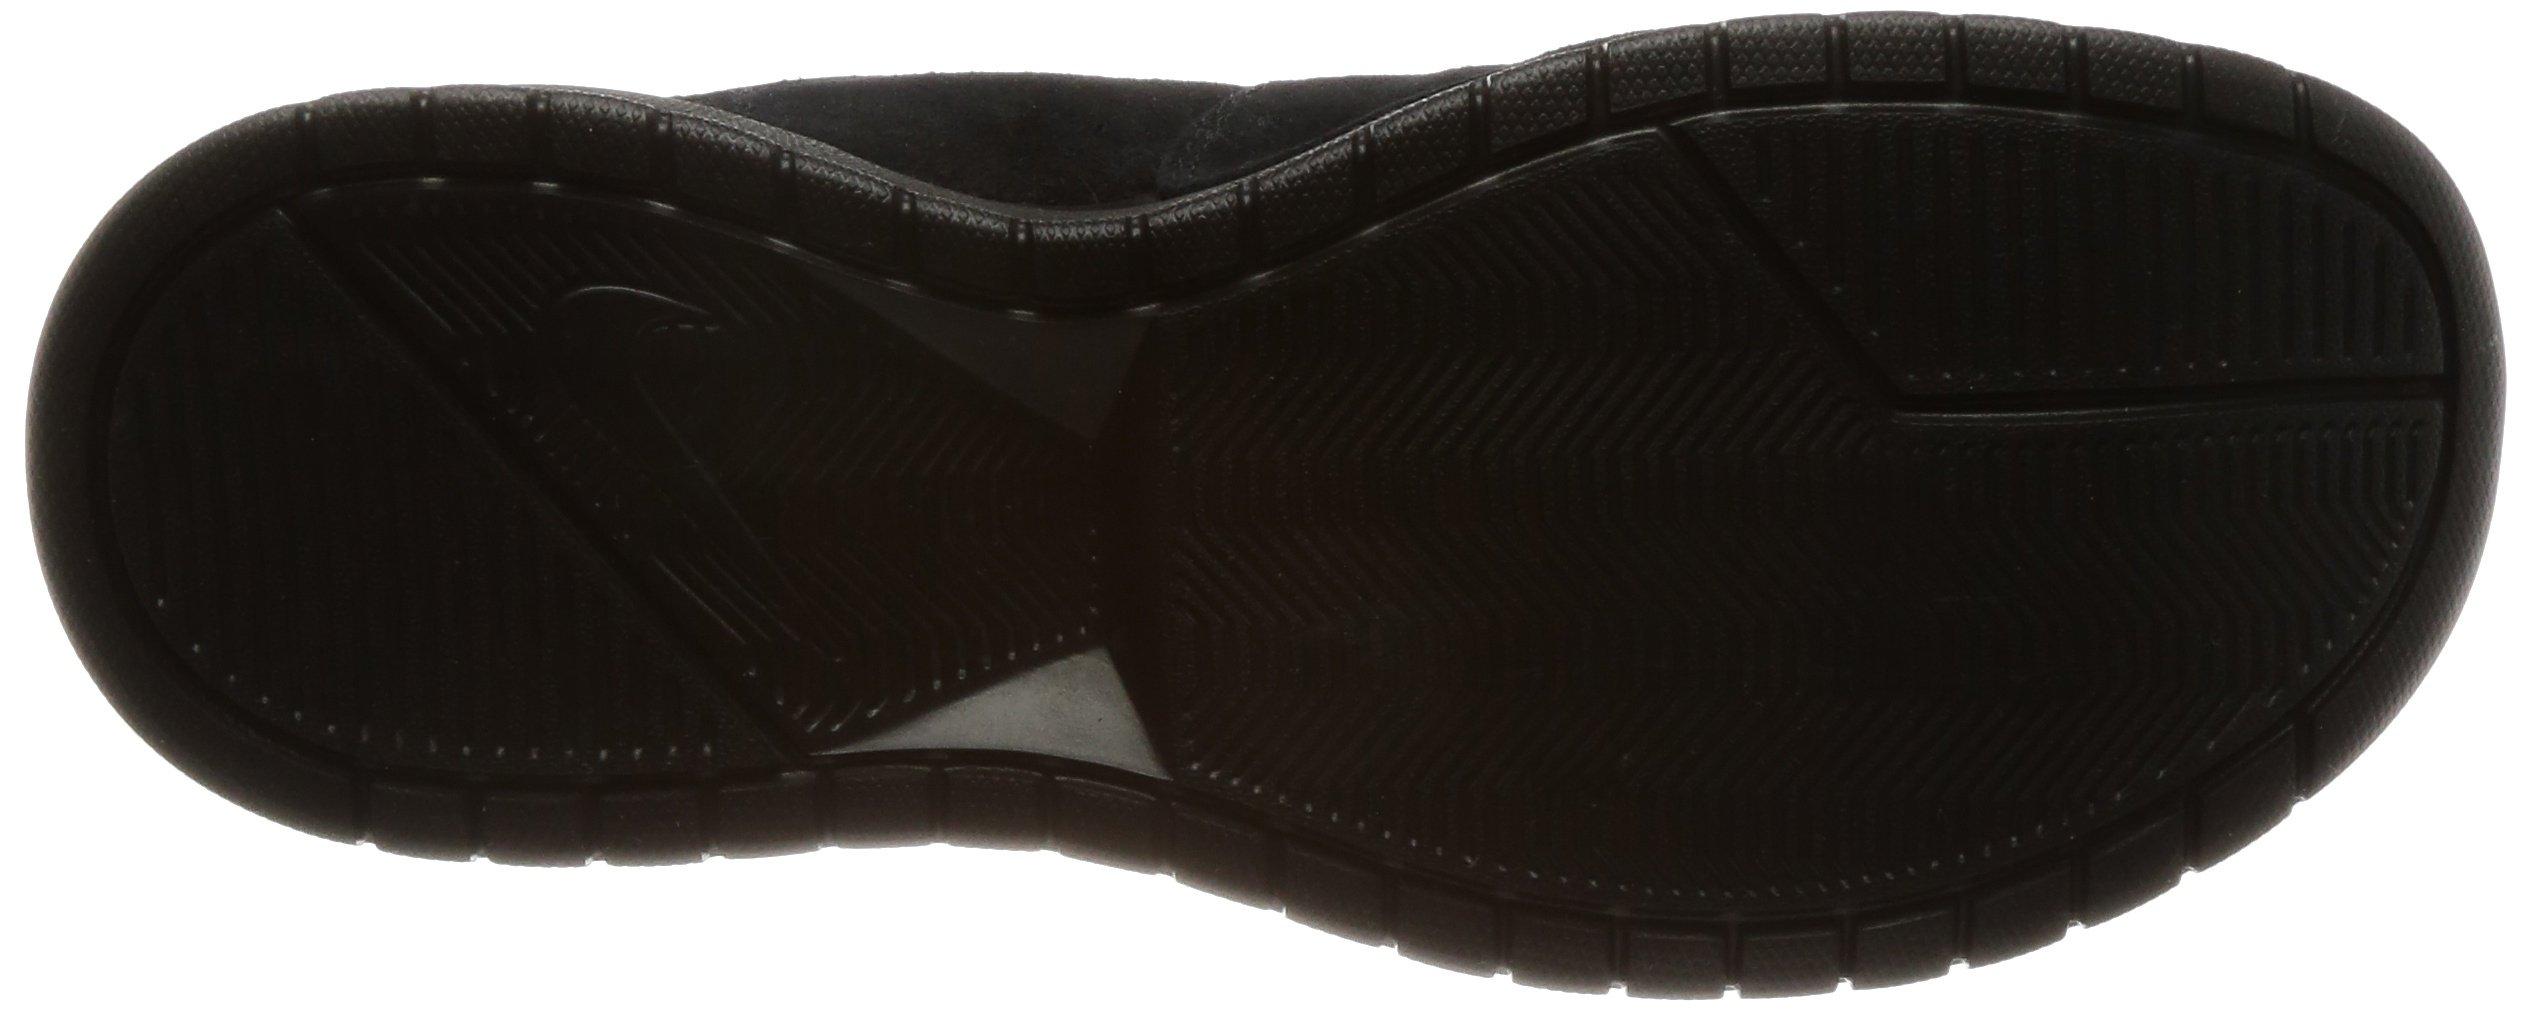 Nike BENASSI SLP Mens fashion-sneakers 882410-003_9.5 - BLACK/BLACK-BLACK by NIKE (Image #3)